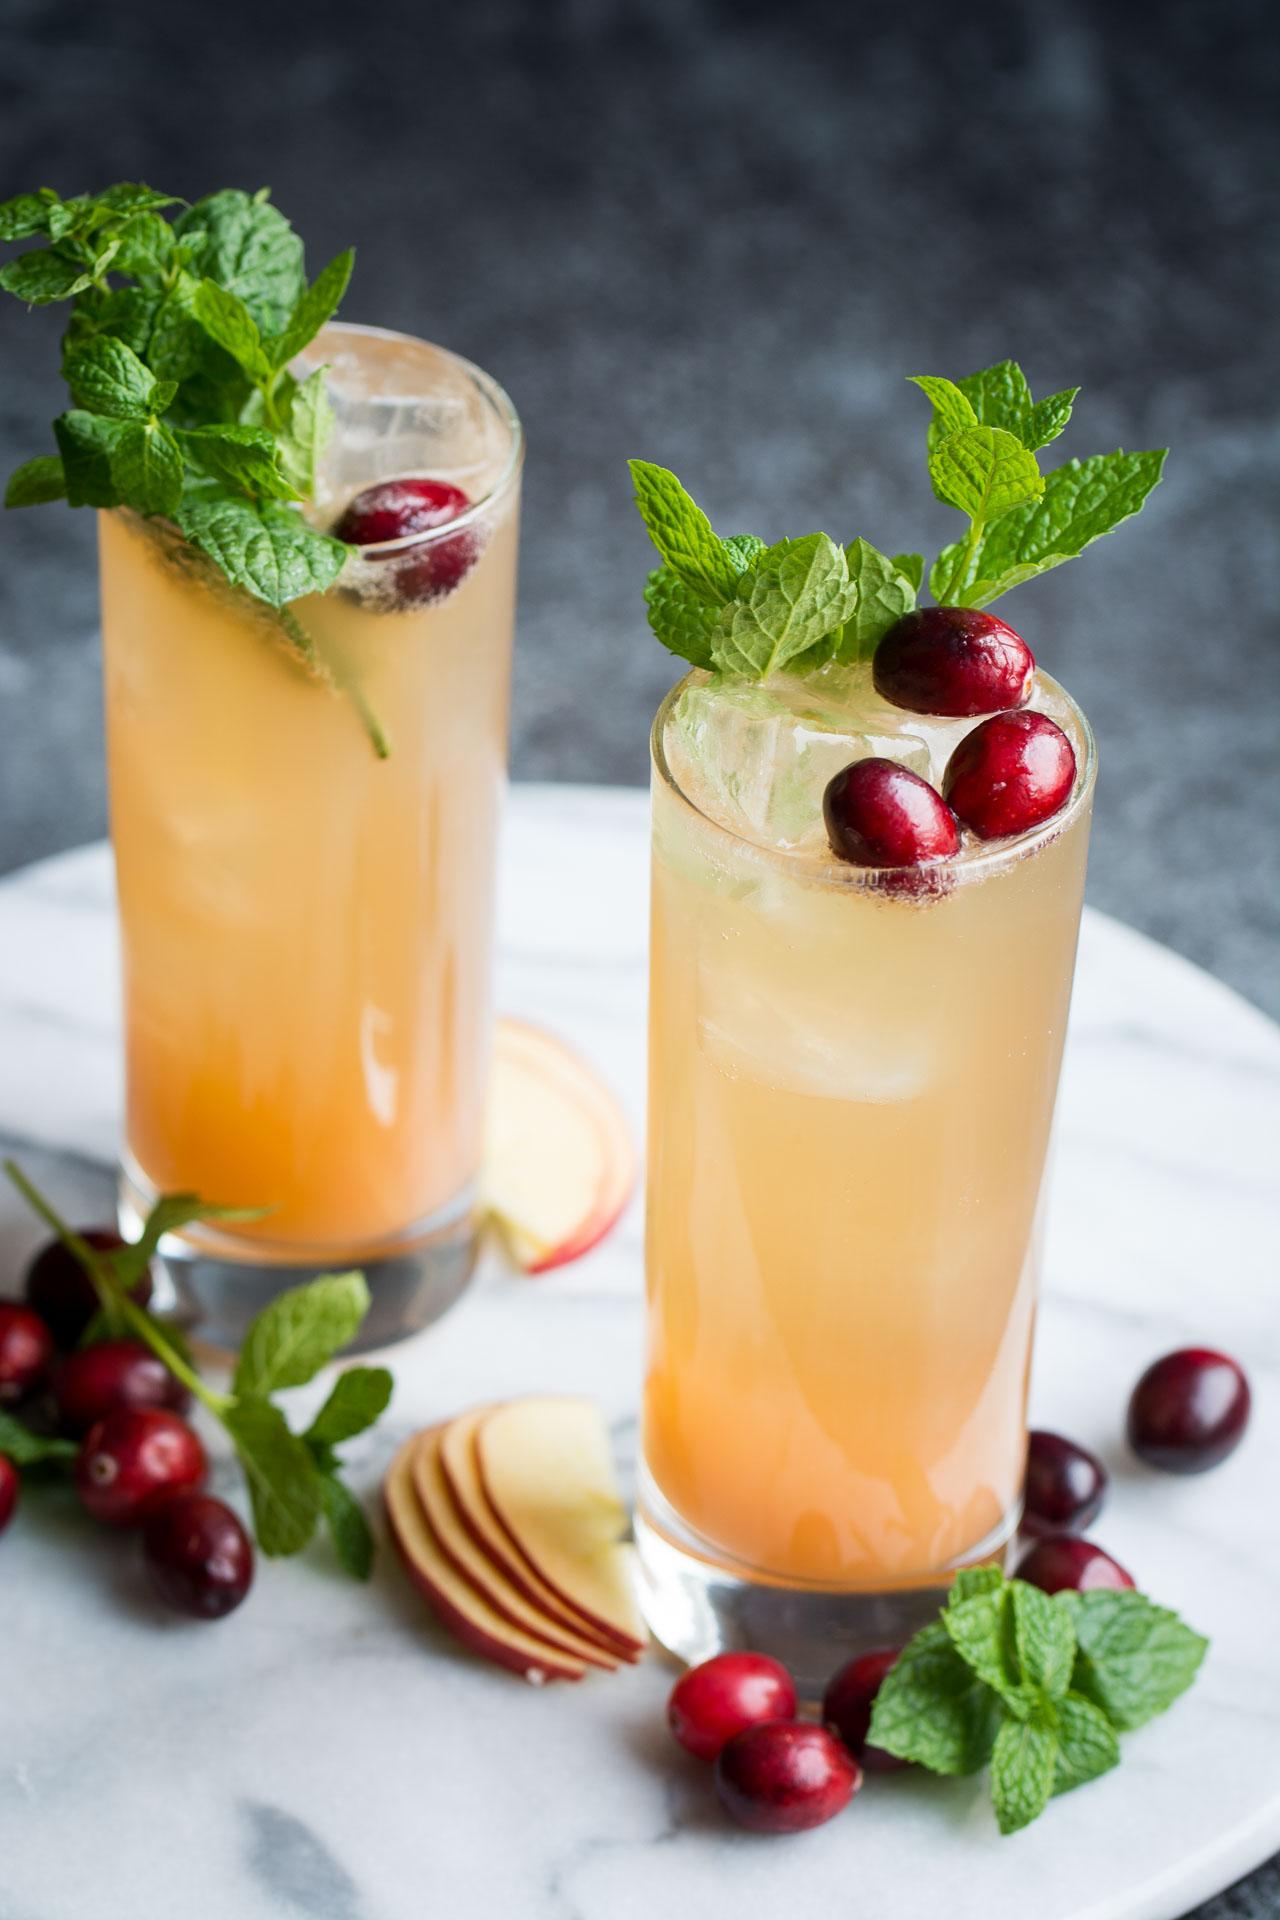 Recipe and image:    http://laurencariscooks.com/grapefruit-ginger-spritzer/